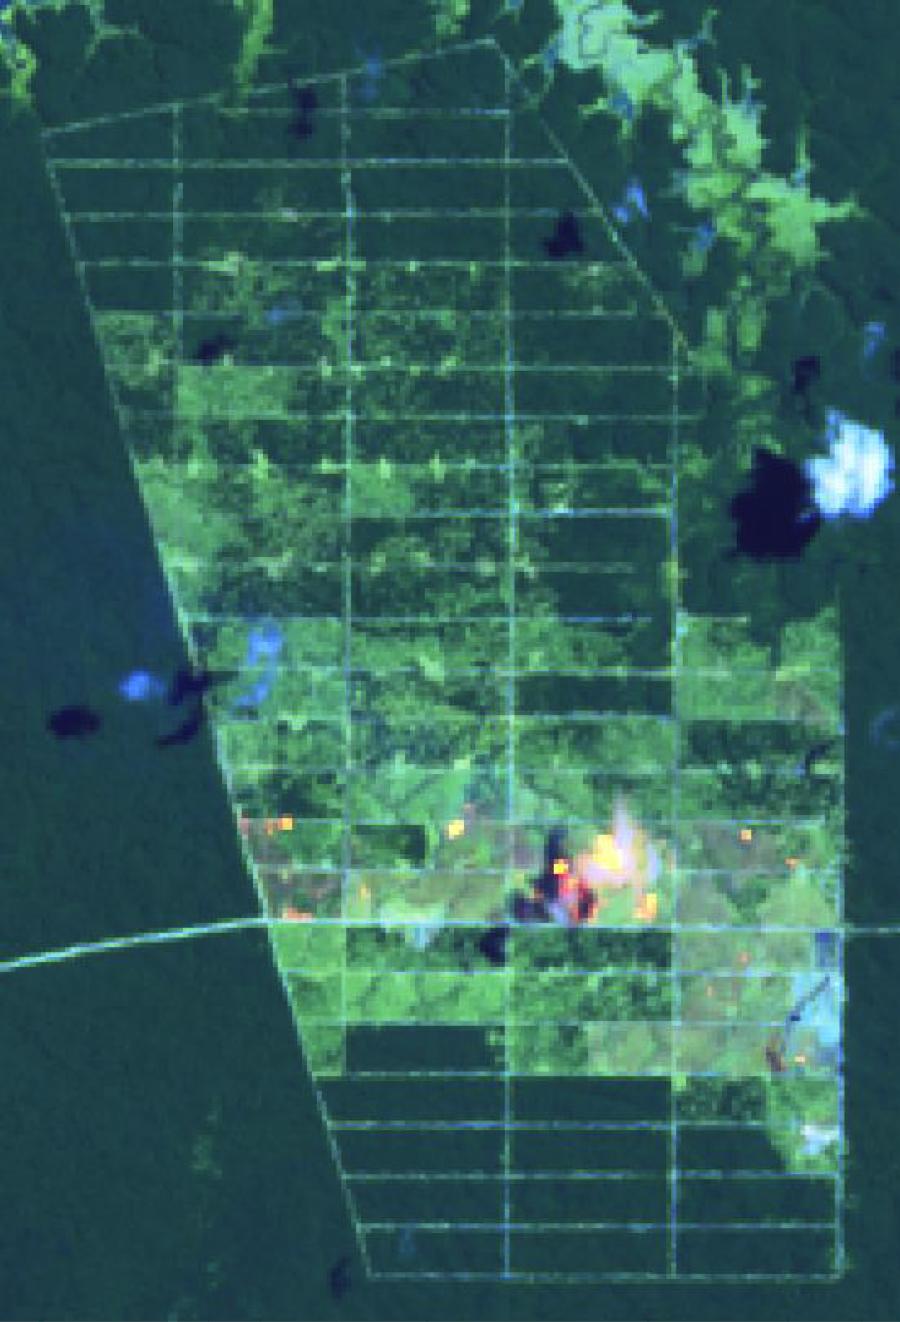 Fires in Korindo's Agro Lestari concession on Papua, Sept 6-14 2015.